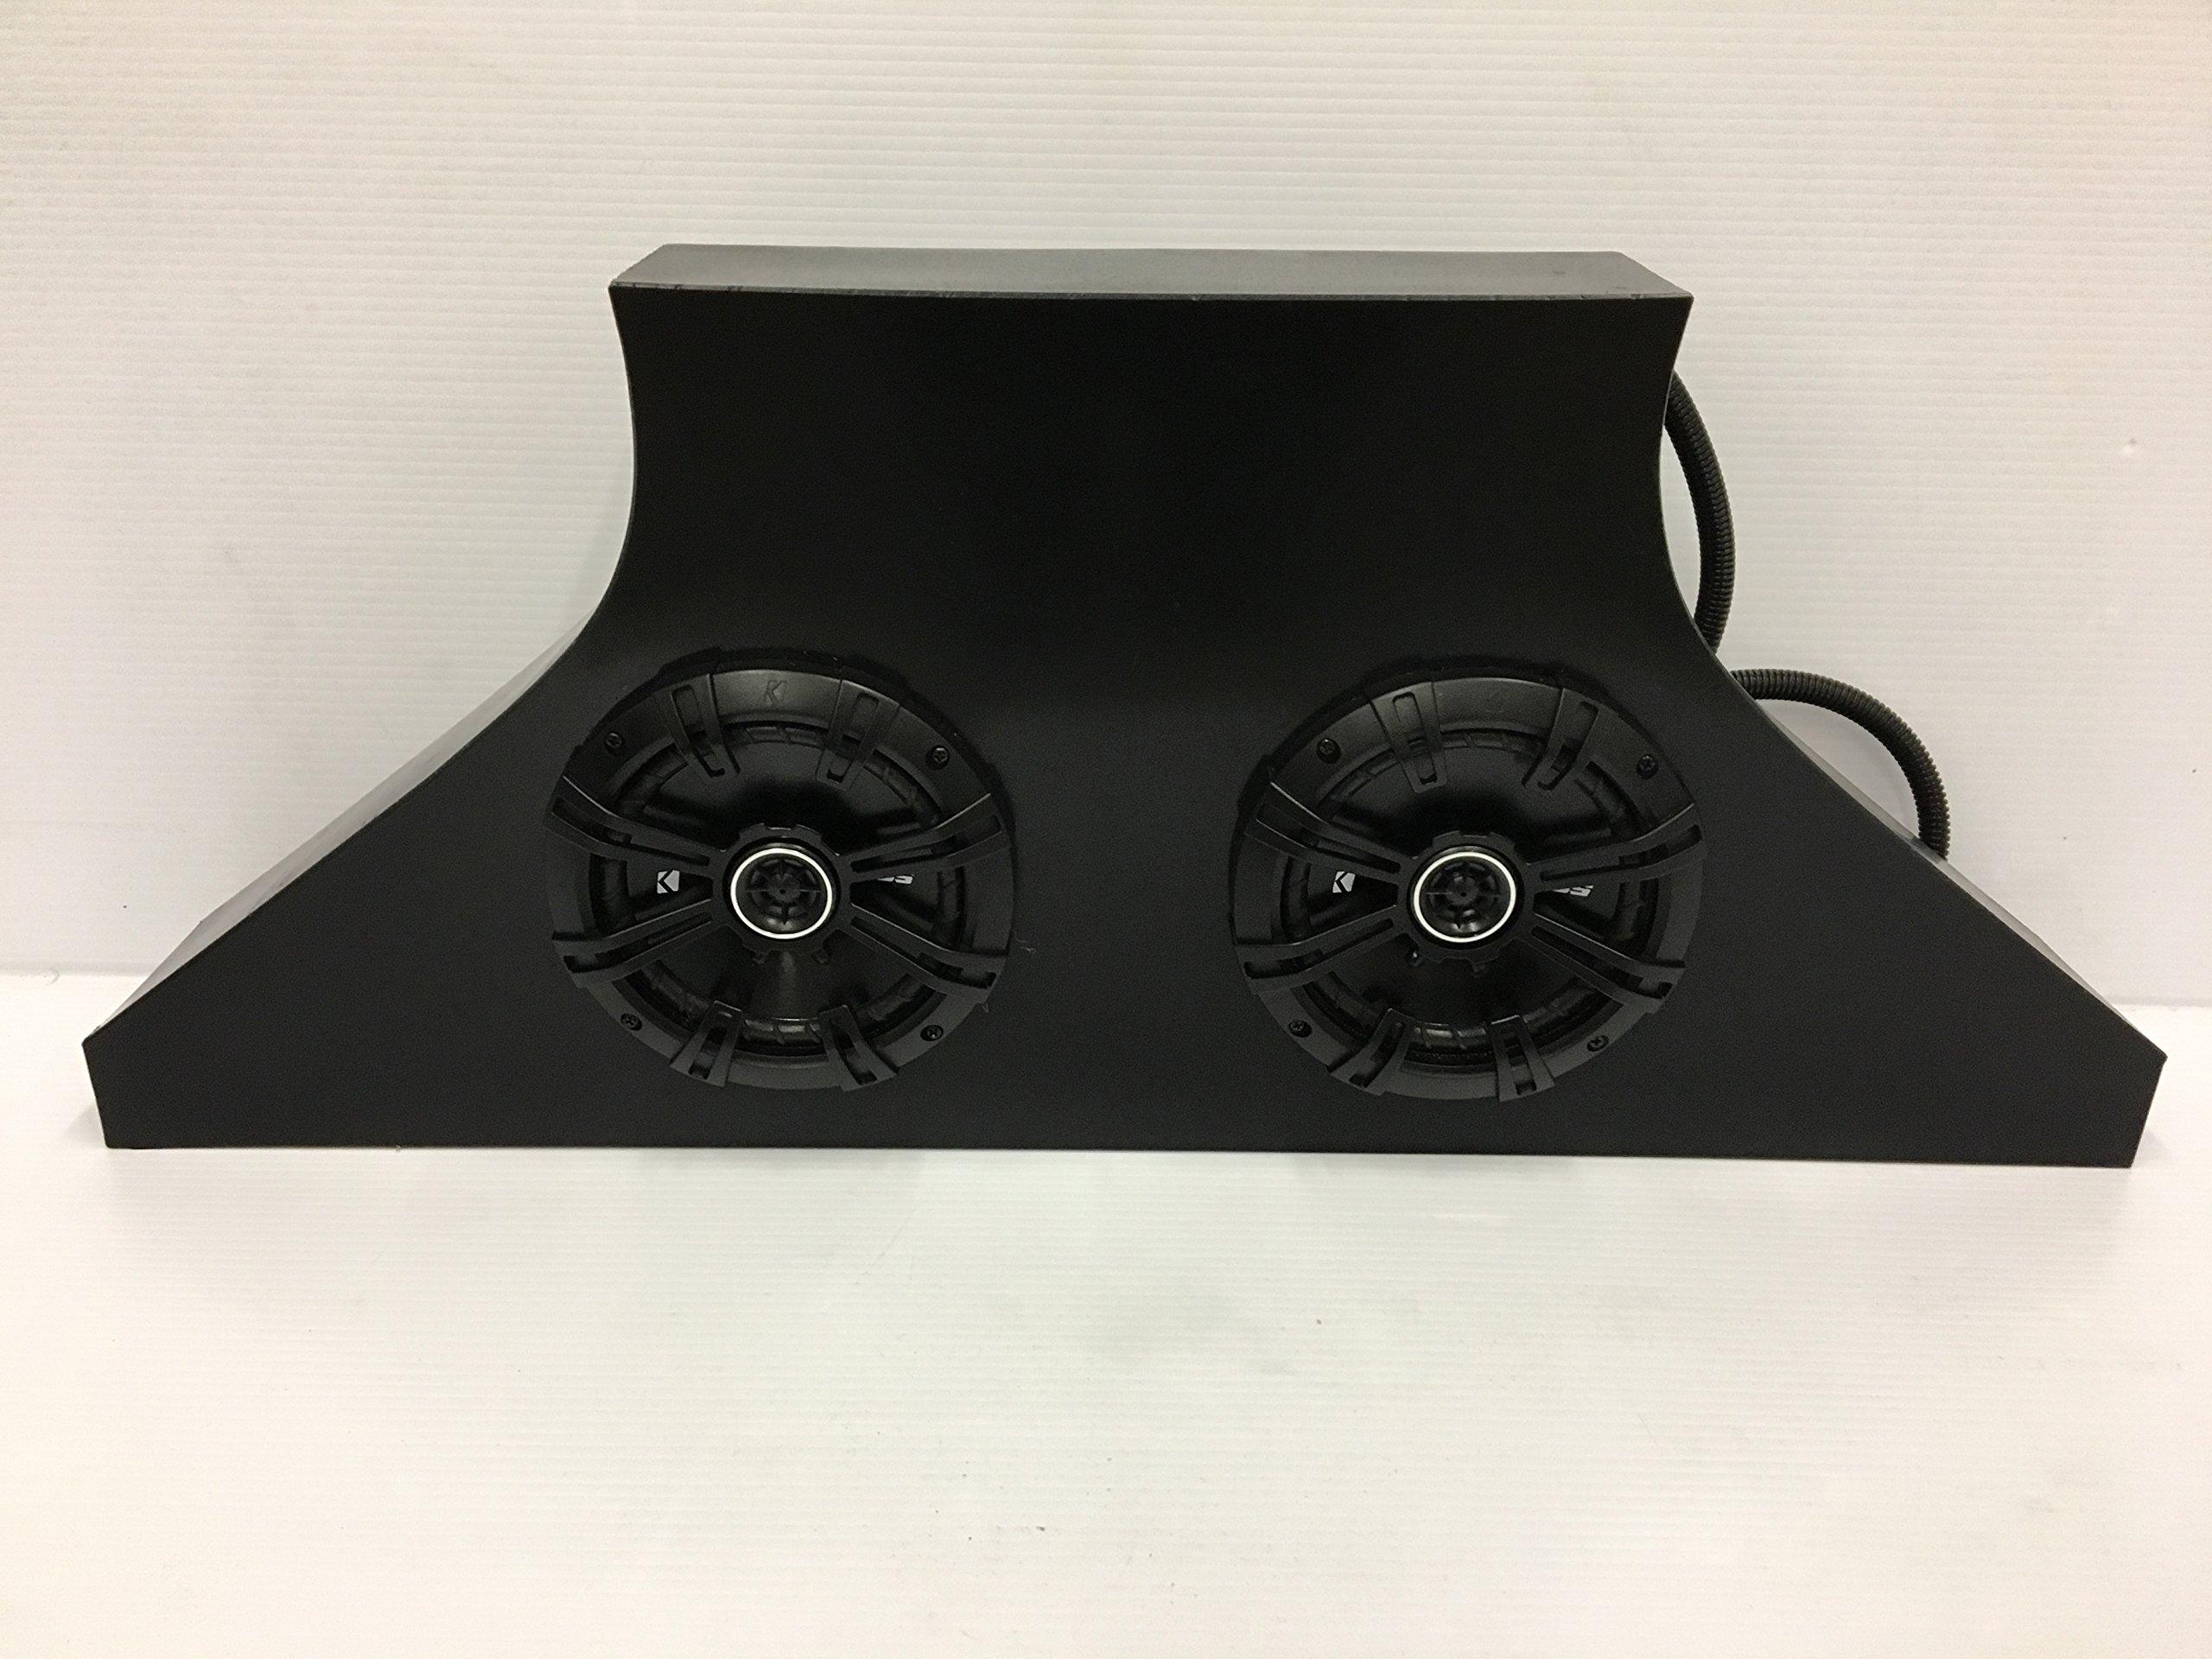 SD 2R2B -Polaris RZR Rear Stereo Box (2-6.5'' marine speakers)